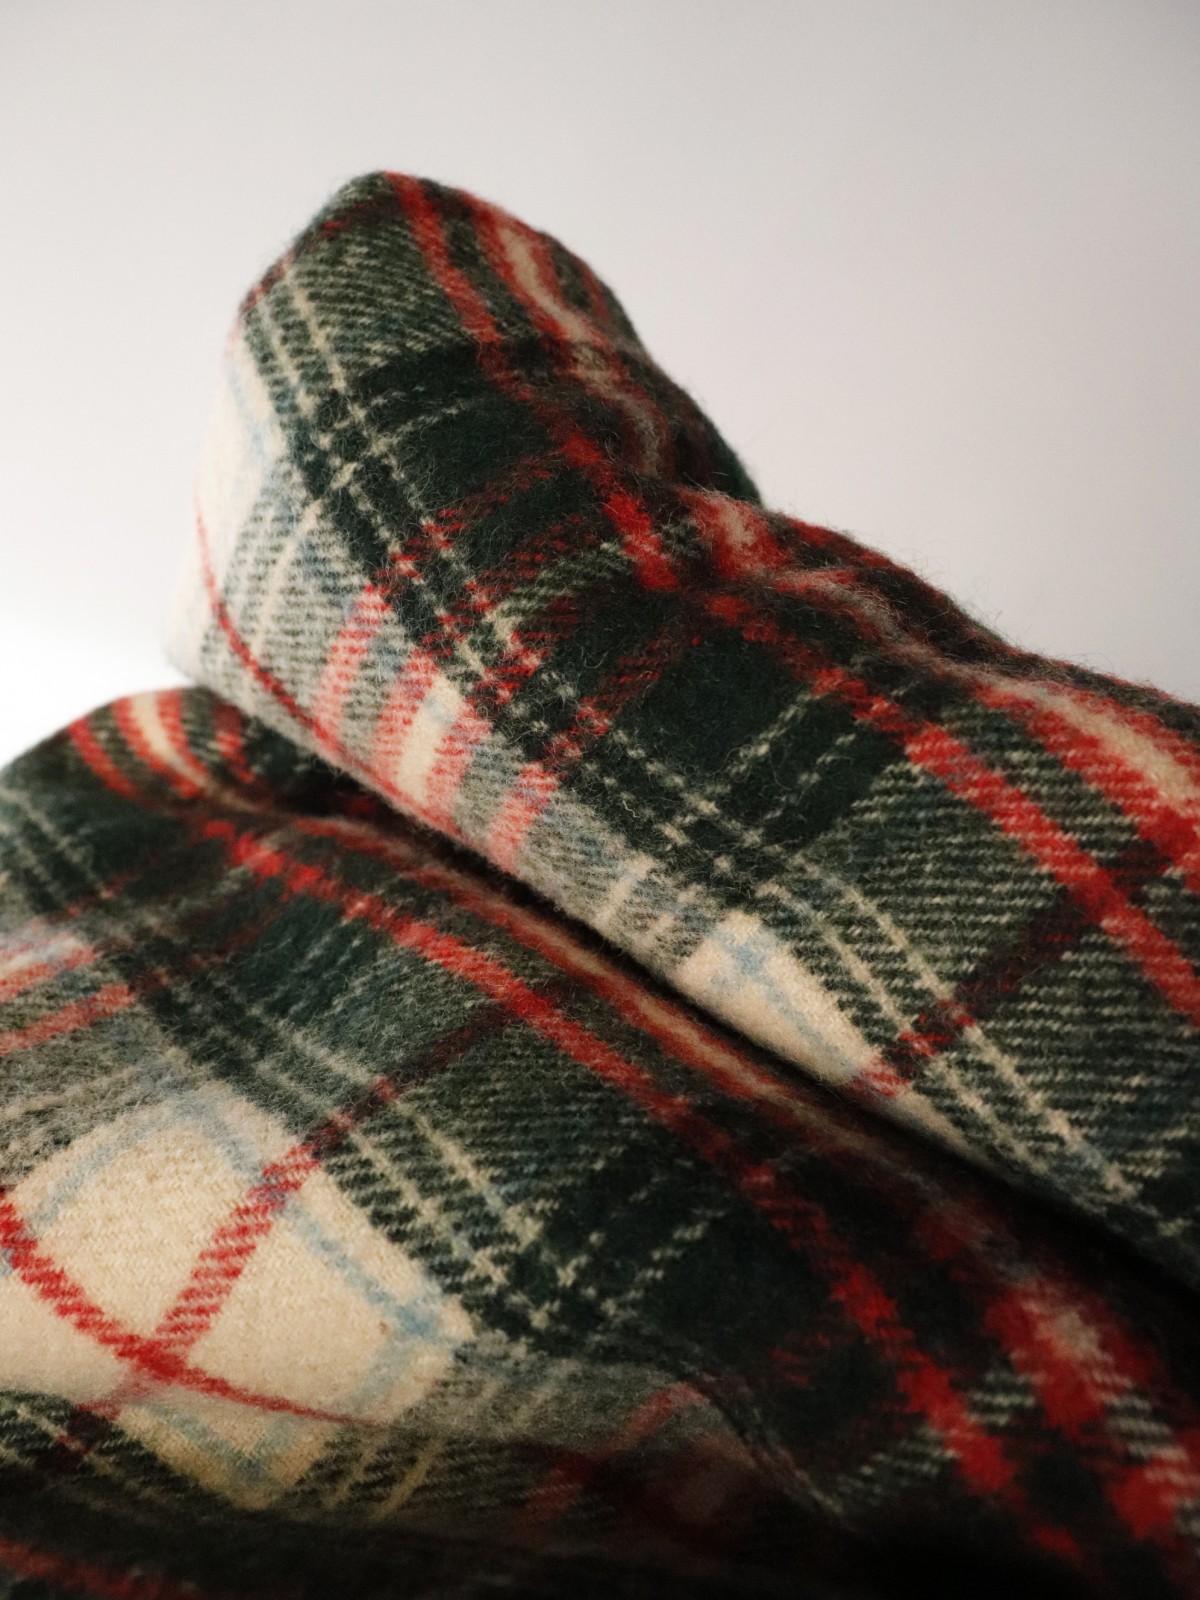 tartan check blanket, usa, vintage blanket